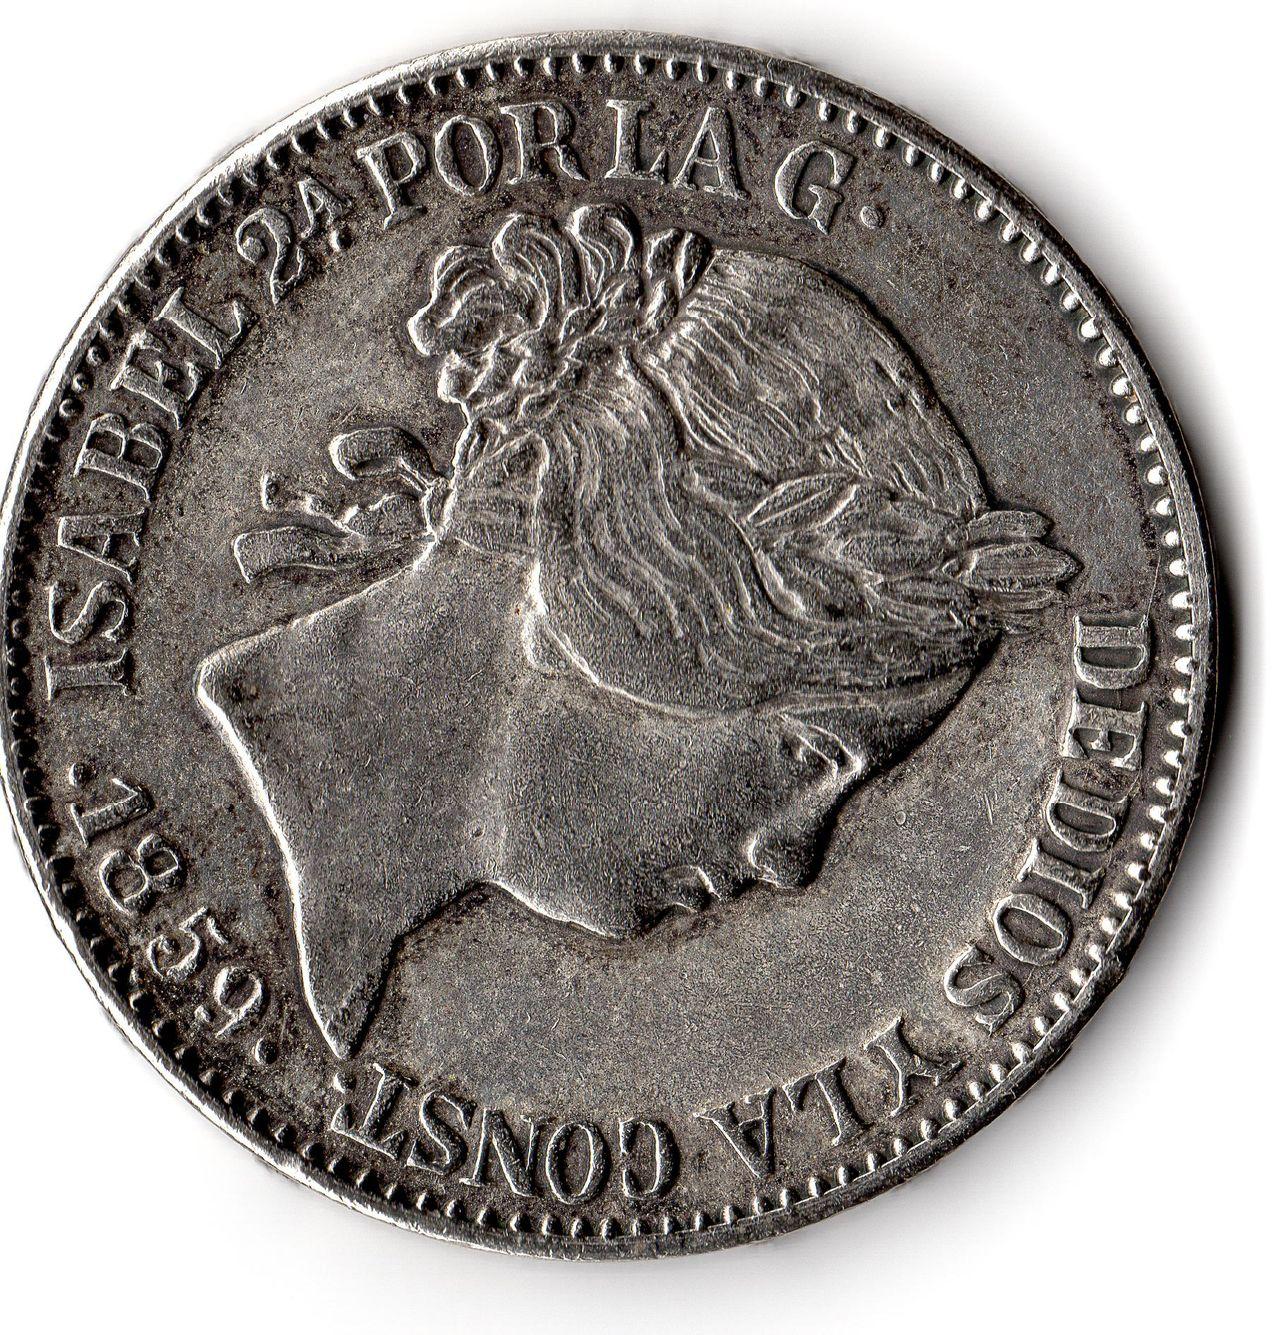 20 reales Isabel II 1859 CECA MADRID (Estrella 6 puntas) Img017